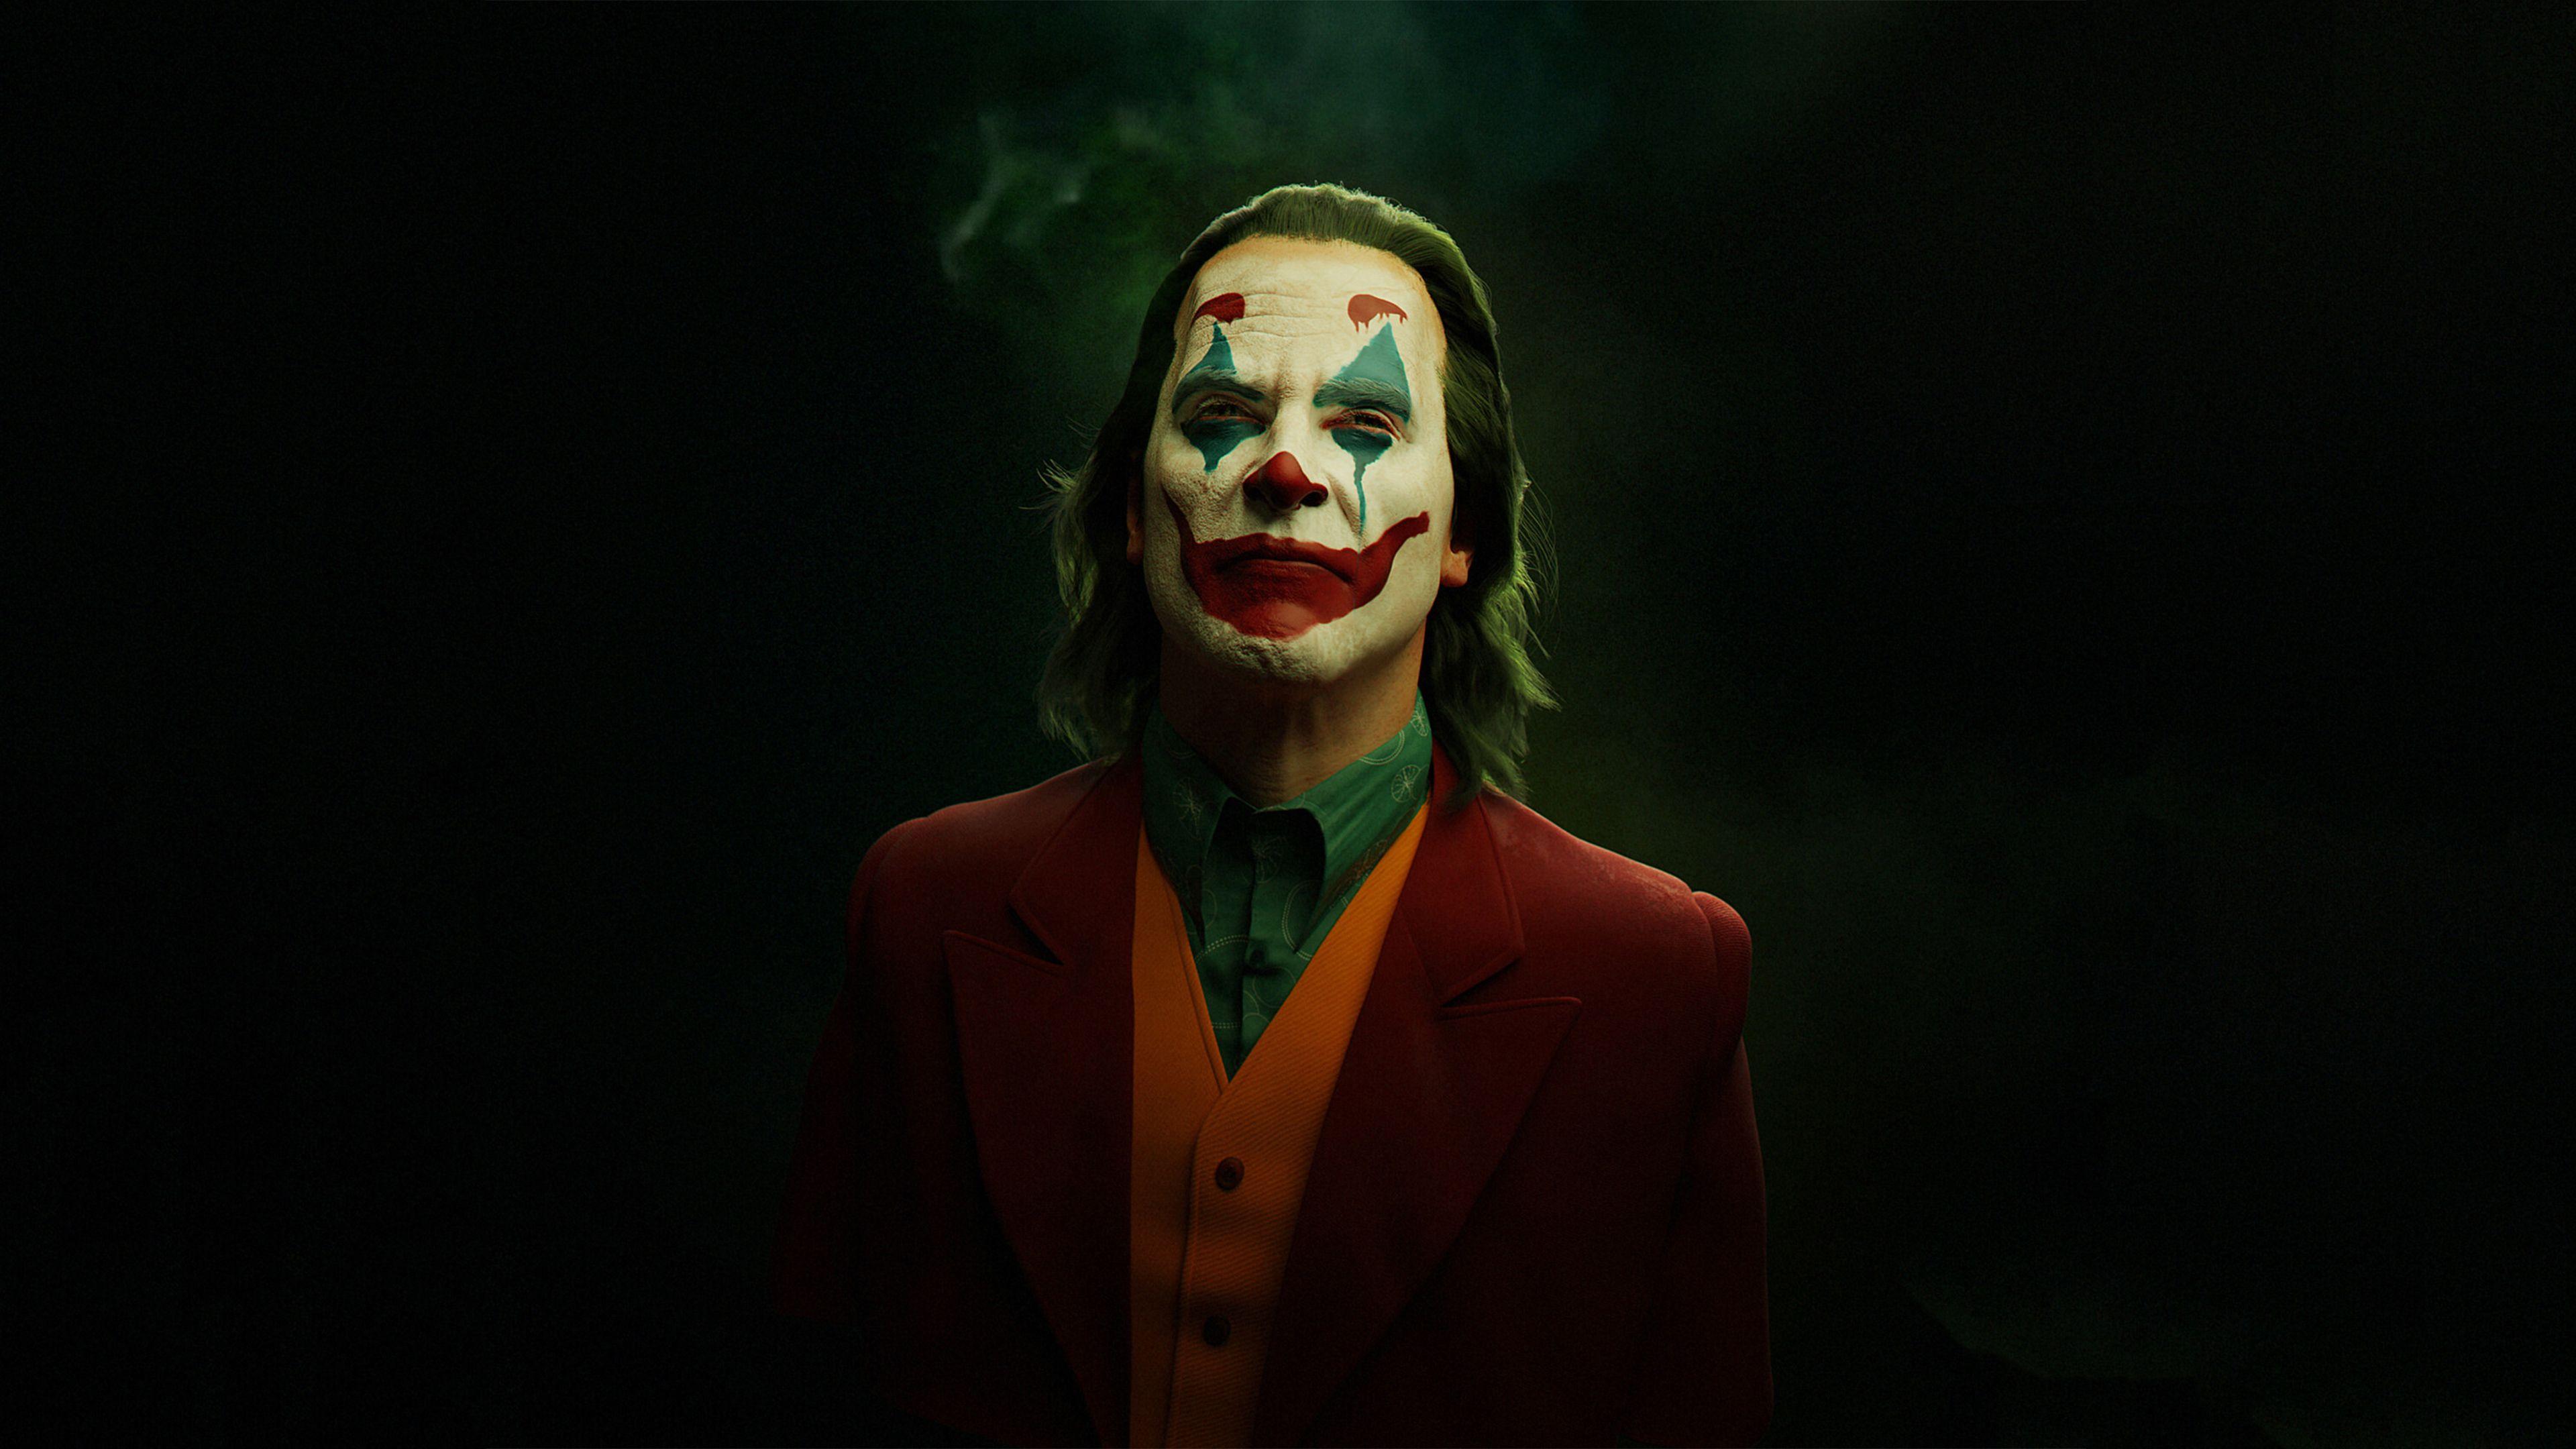 Joker Art Joker Wallpaper 4k Hd Joker Phone Wallpaper 4k Hd Joker Hd Wallpaper 4k Joker Art Wallpaper Hd Joker Hd Wallpaper Joker Wallpapers Joker Wallpaper